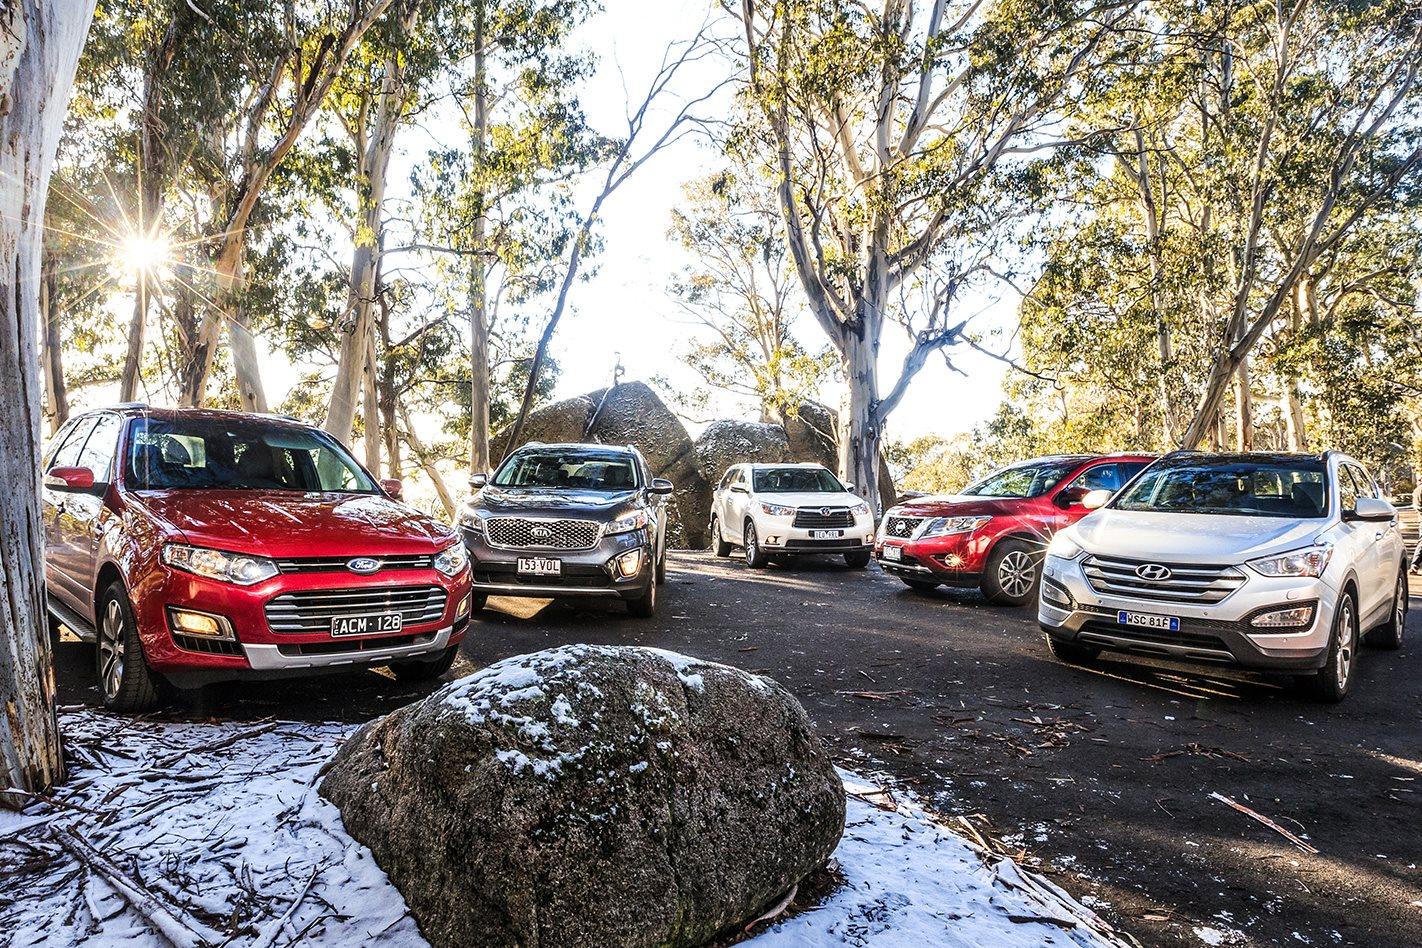 Ford Territory v Hyundai Santa Fe v Kia Sorento v Nissan Pathfinder